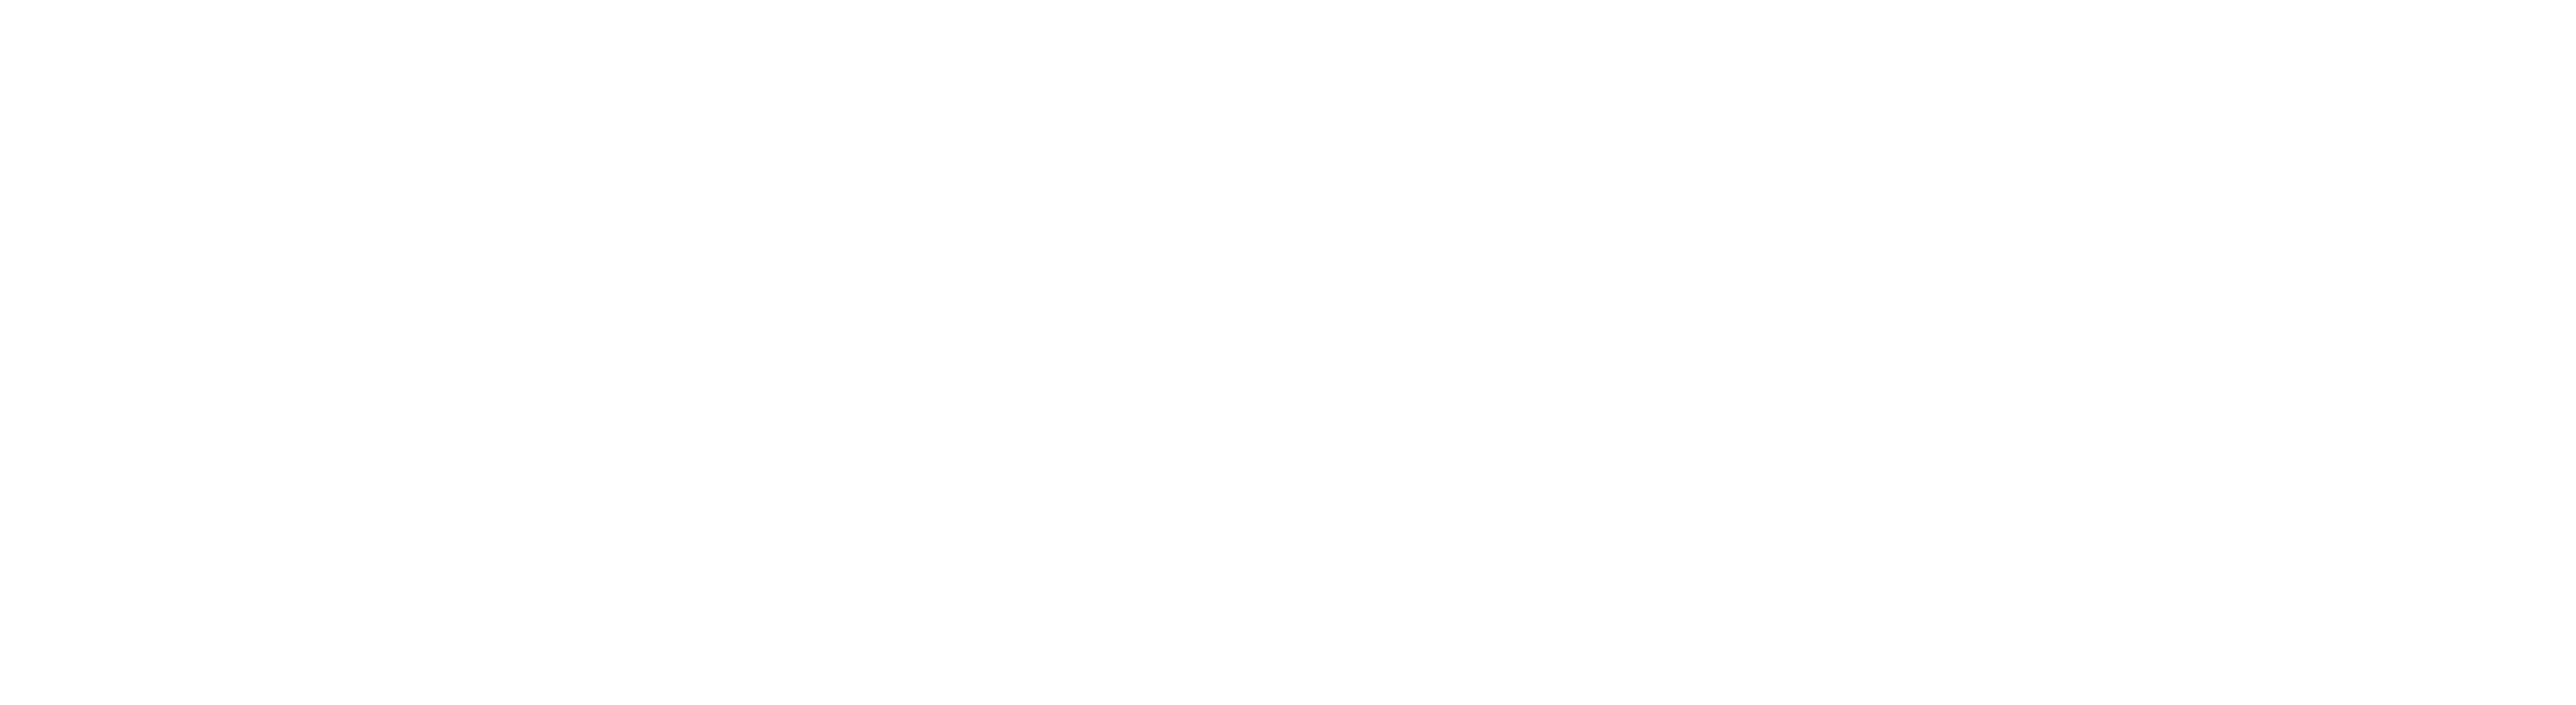 Top Graduate